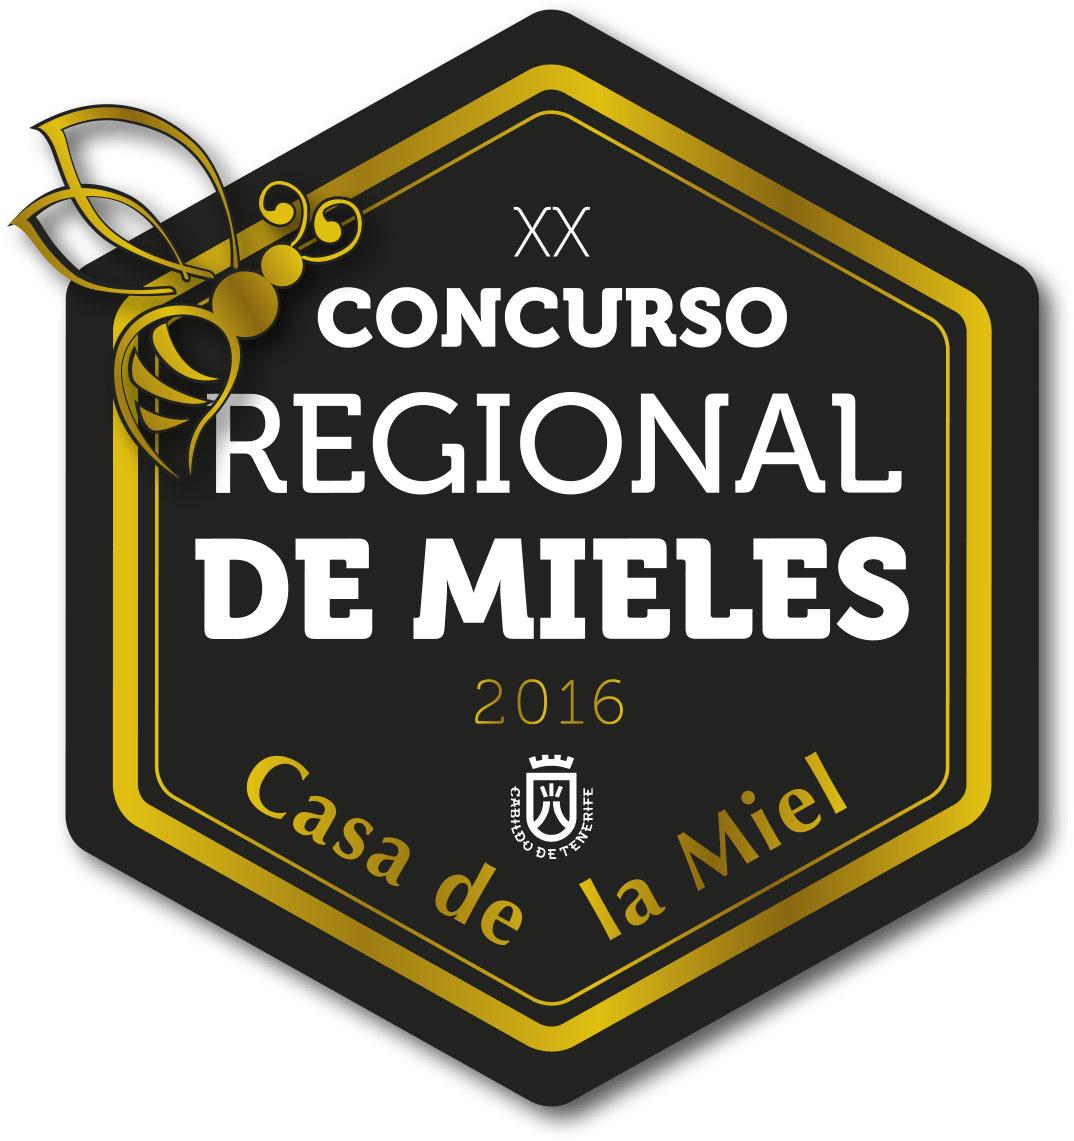 XX Concurso de mieles casa de la miel, cabildo de Tenerife